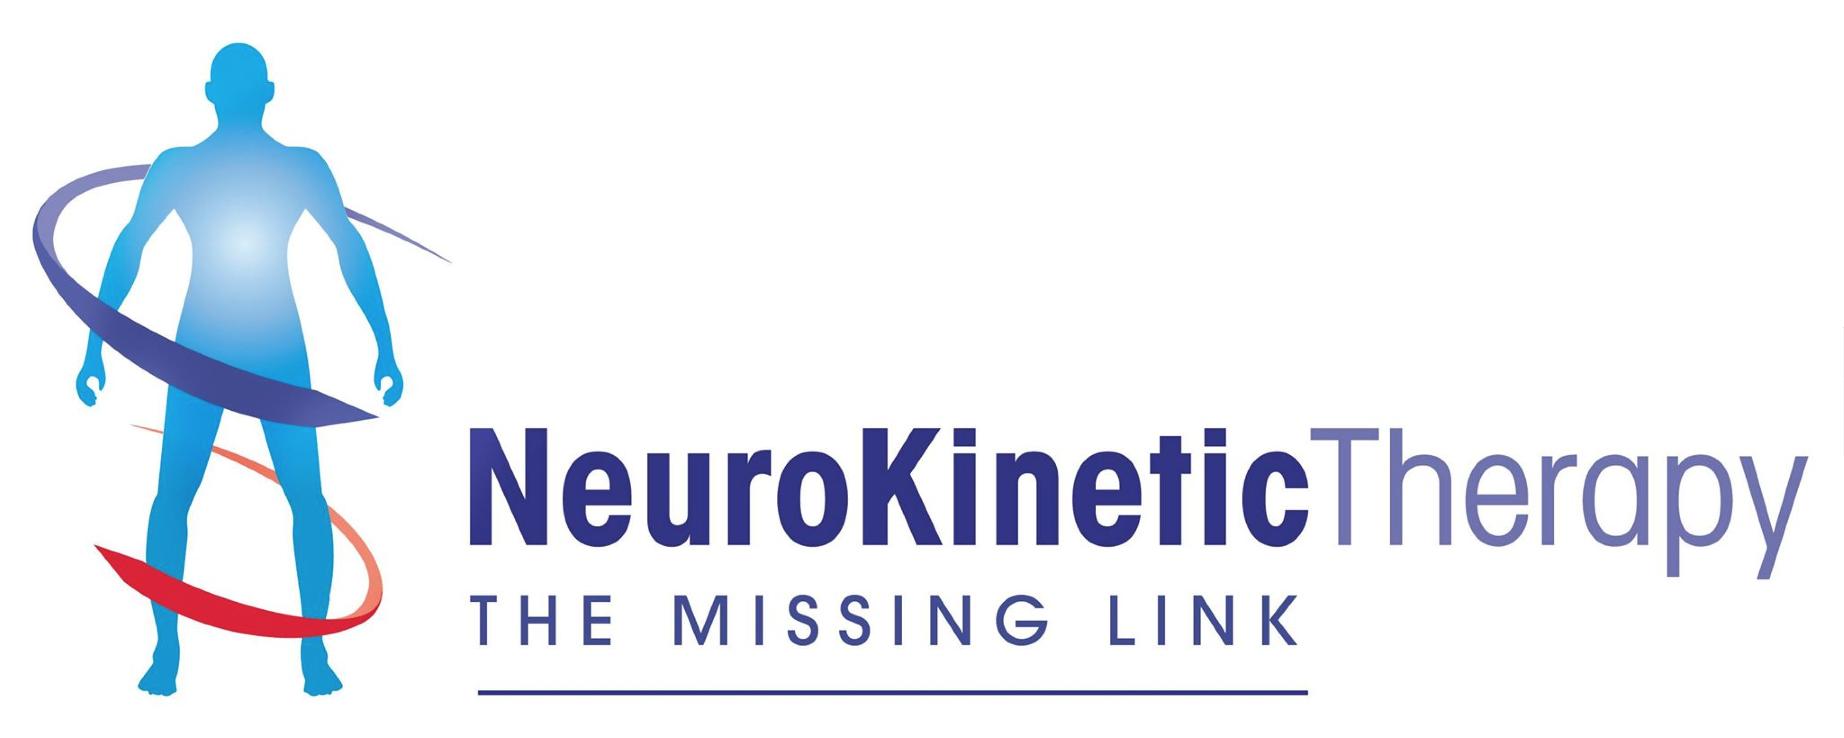 Neurokinetic Therapy, Neurokinetische Therapie, Daniel Müller, Perform Better